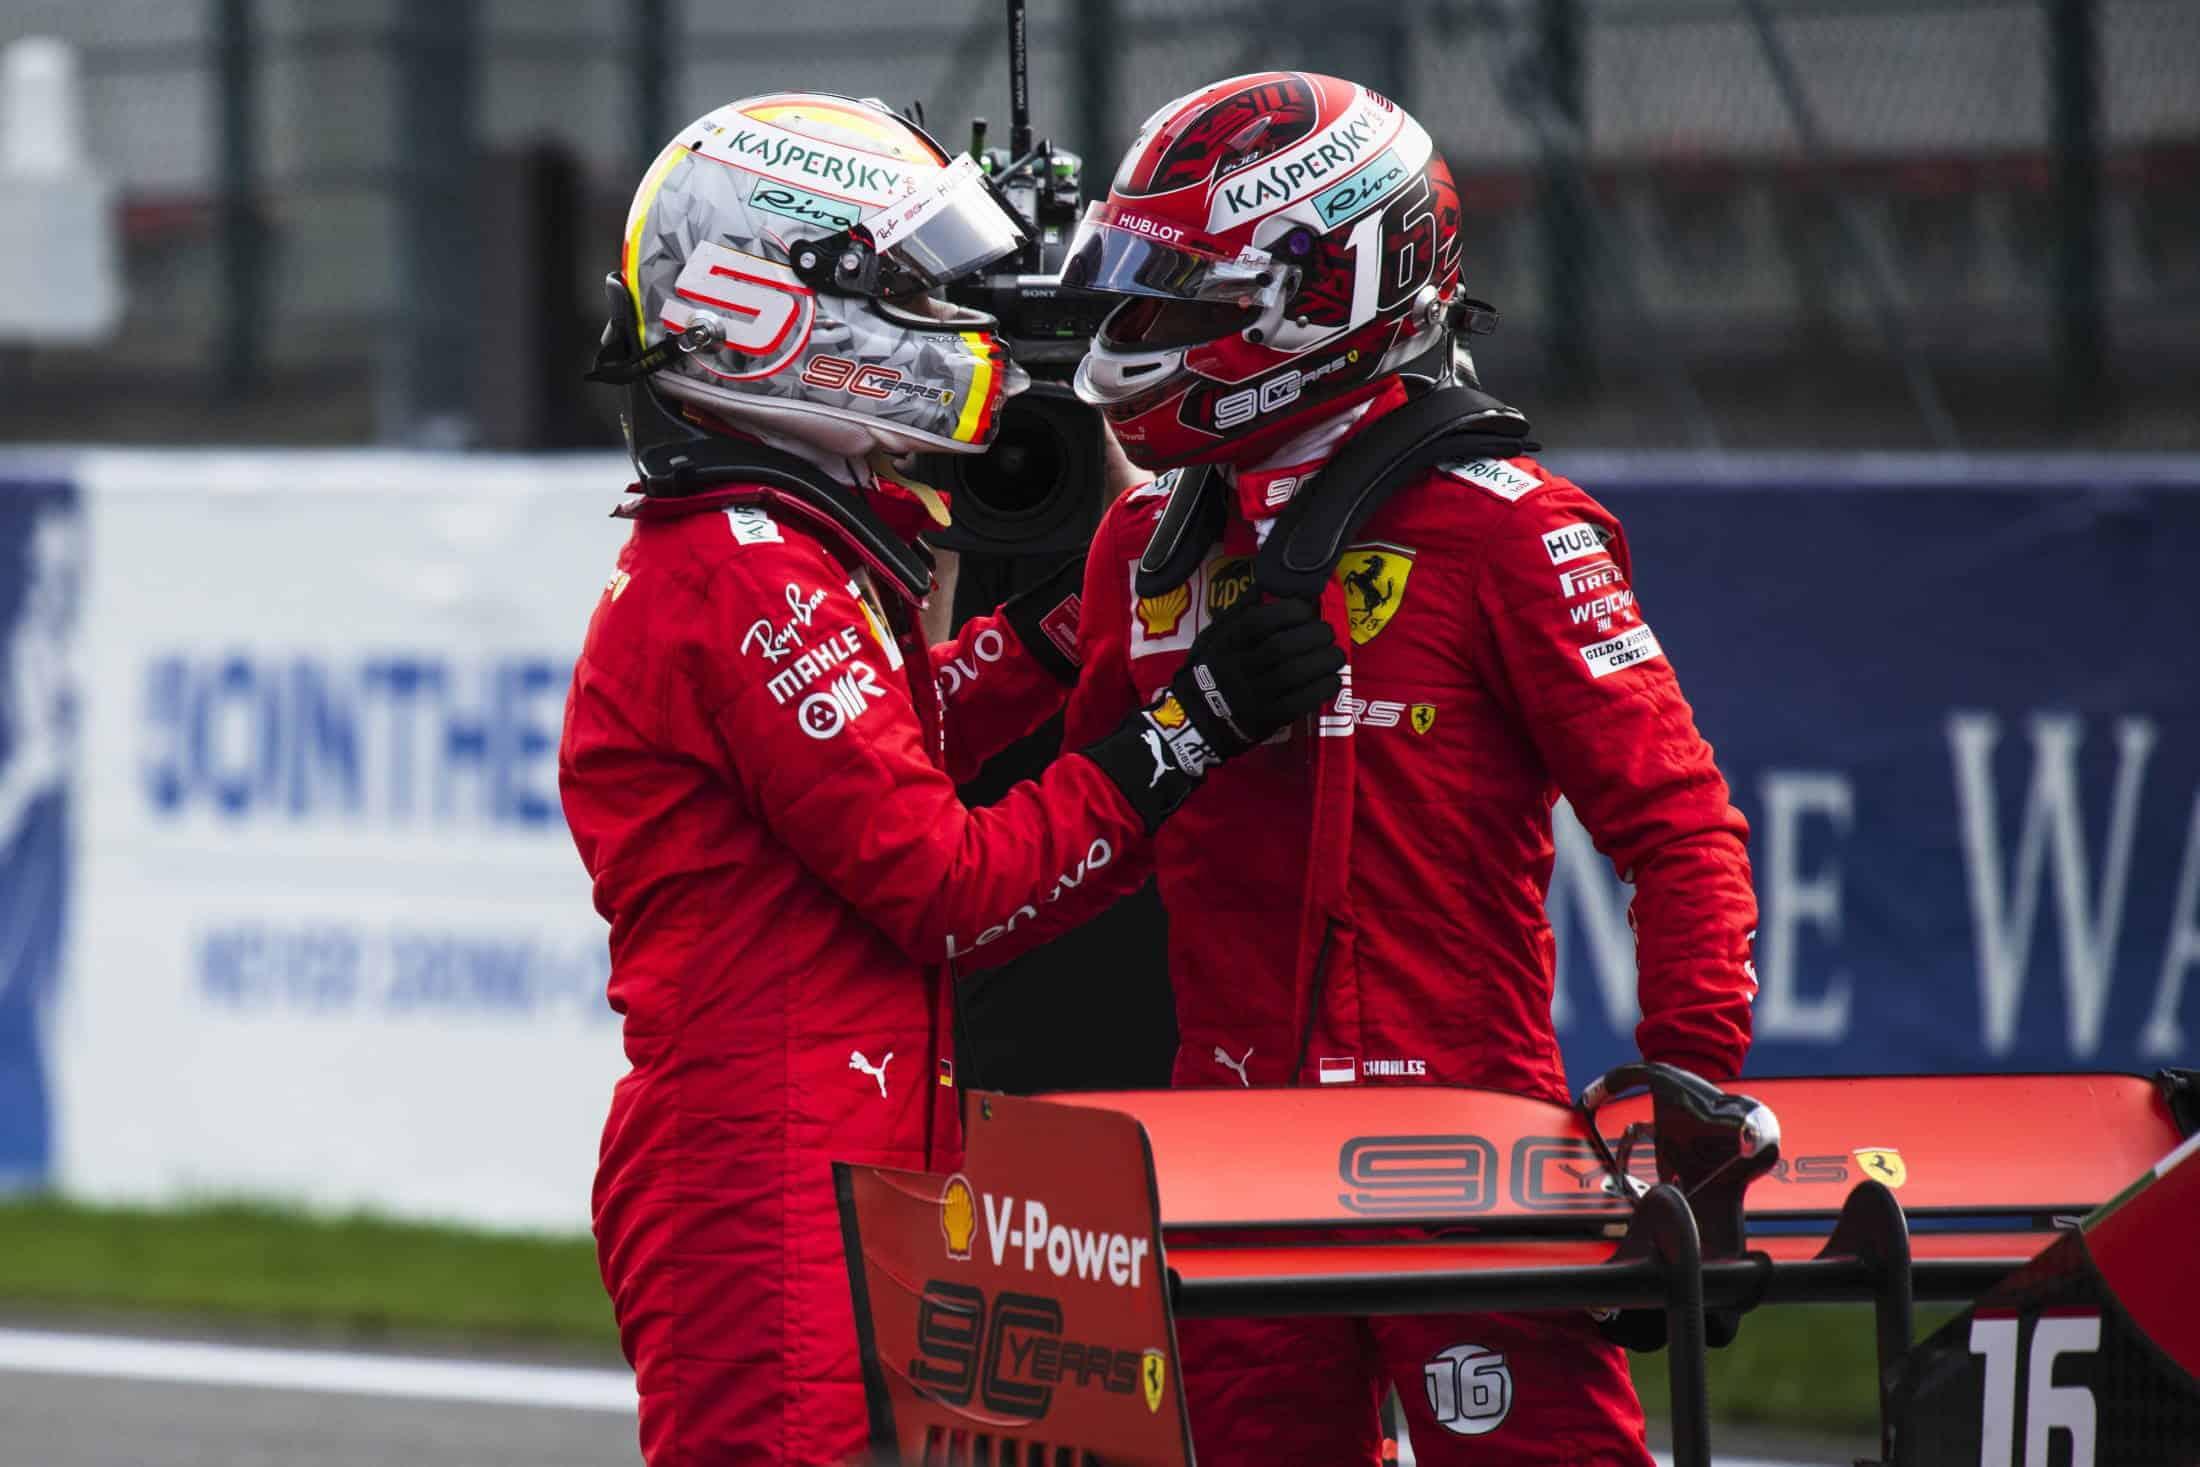 Charles Leclerc and Sebastian Vettel Ferrari Belgian GP F1 2019 after Qualifying Photo Ferrari